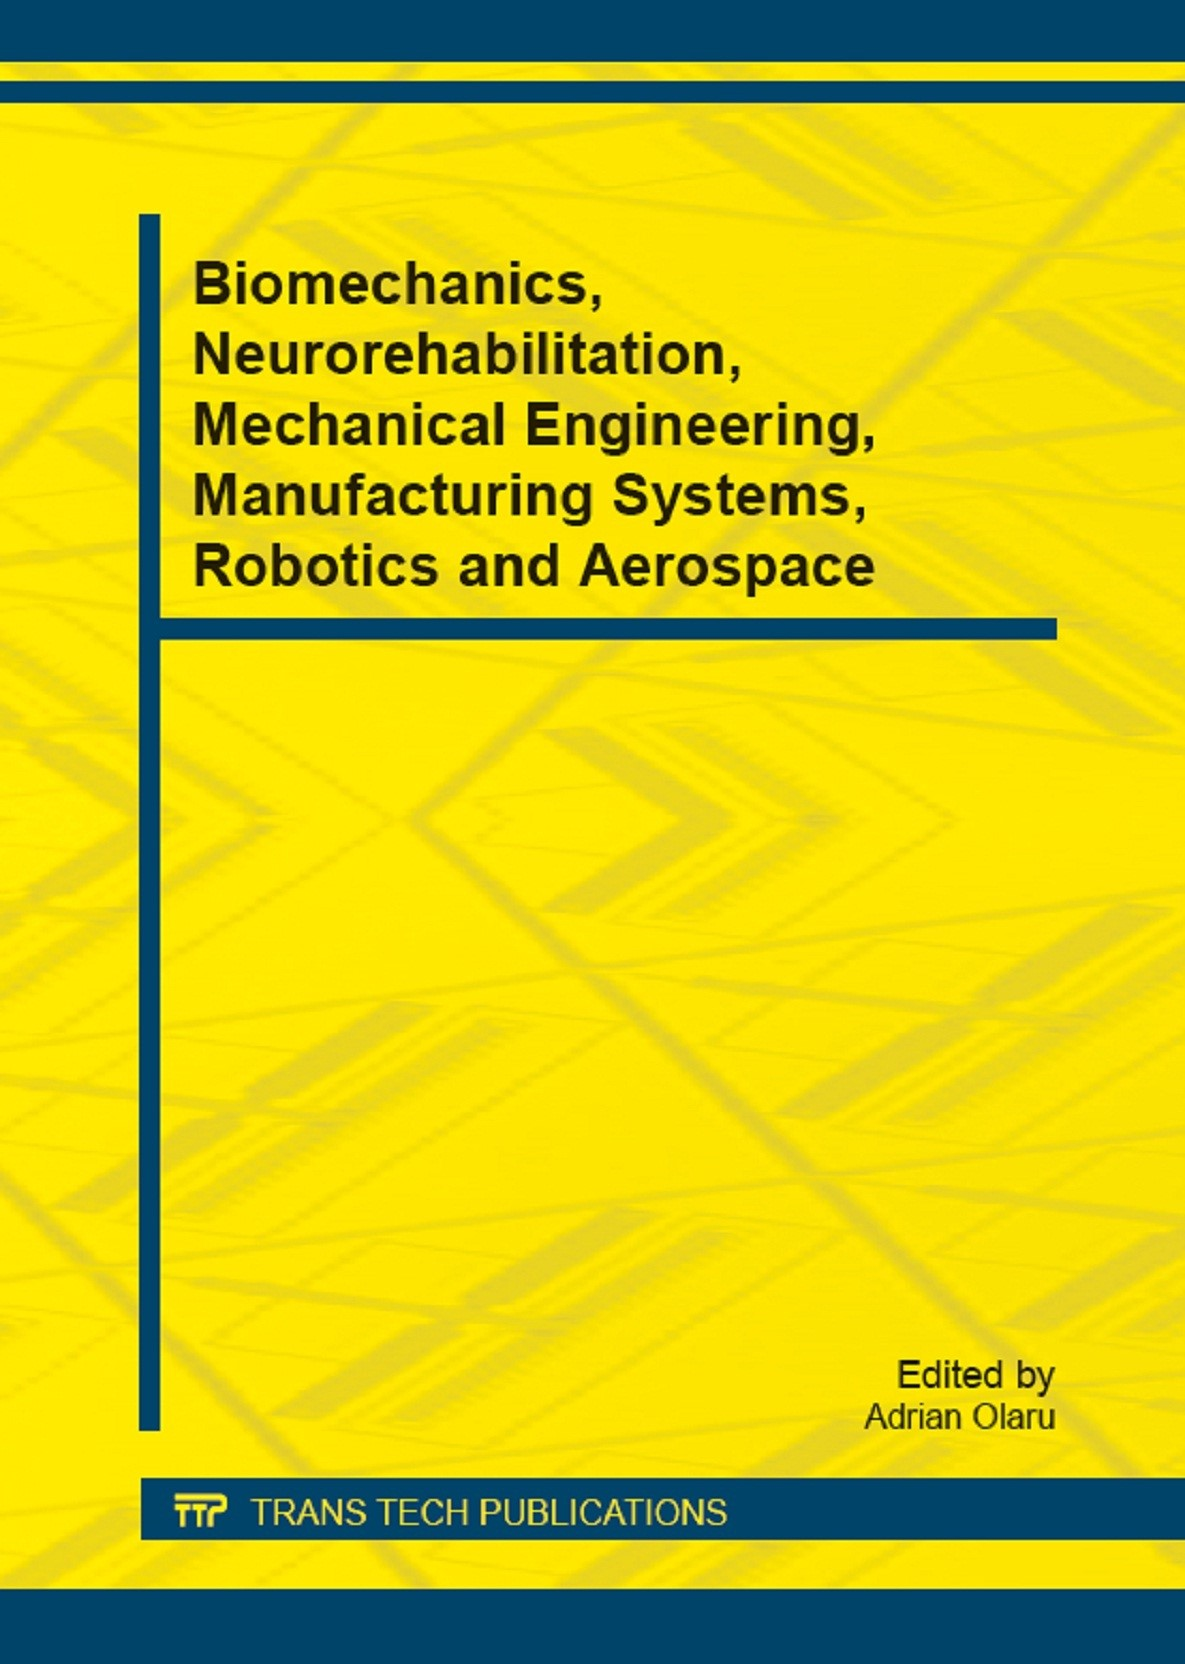 Biomechanics, Neurorehabilitation, Mechanical Engineering, Manufacturing Systems, Robotics and Aerospace | Olaru, 2013 (Cover)